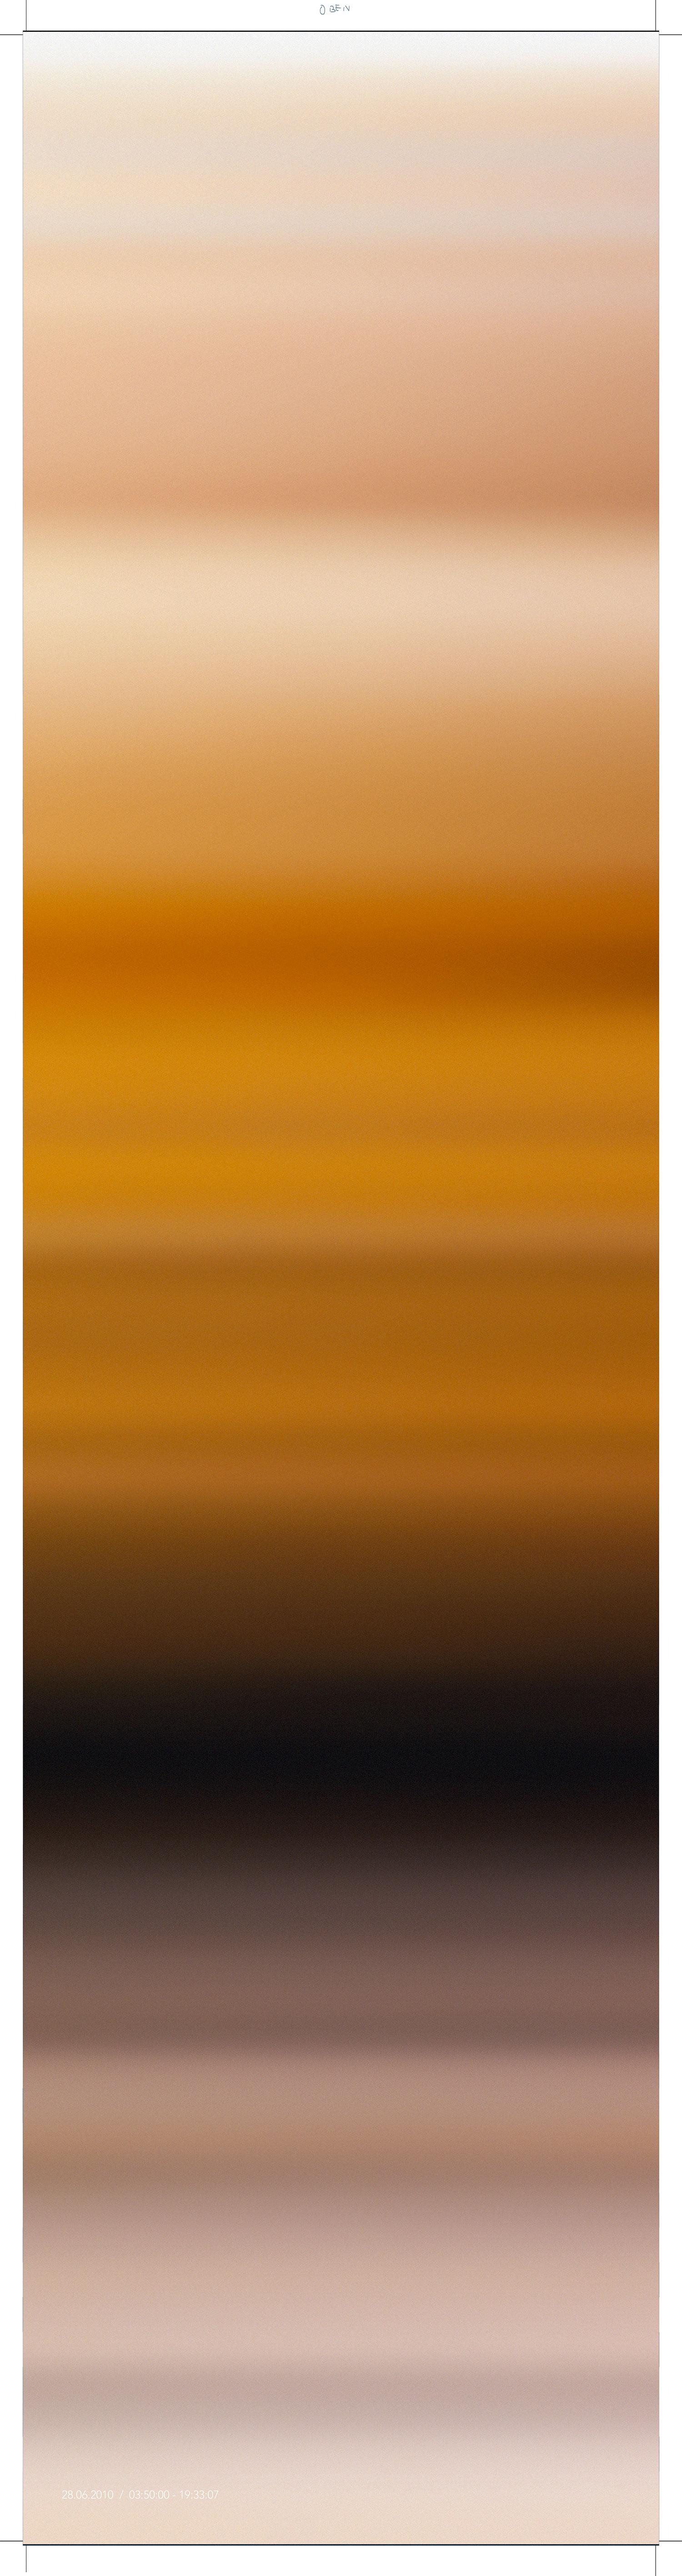 INGE DICK  BLAU, UNENDLICH, 28.6.2010 komplementär 2010 / 54 / 1 Fujicolor Crystal Archive auf Aluminium- Acrylglas, 180 x 45 cm  Photo: Inge Dick